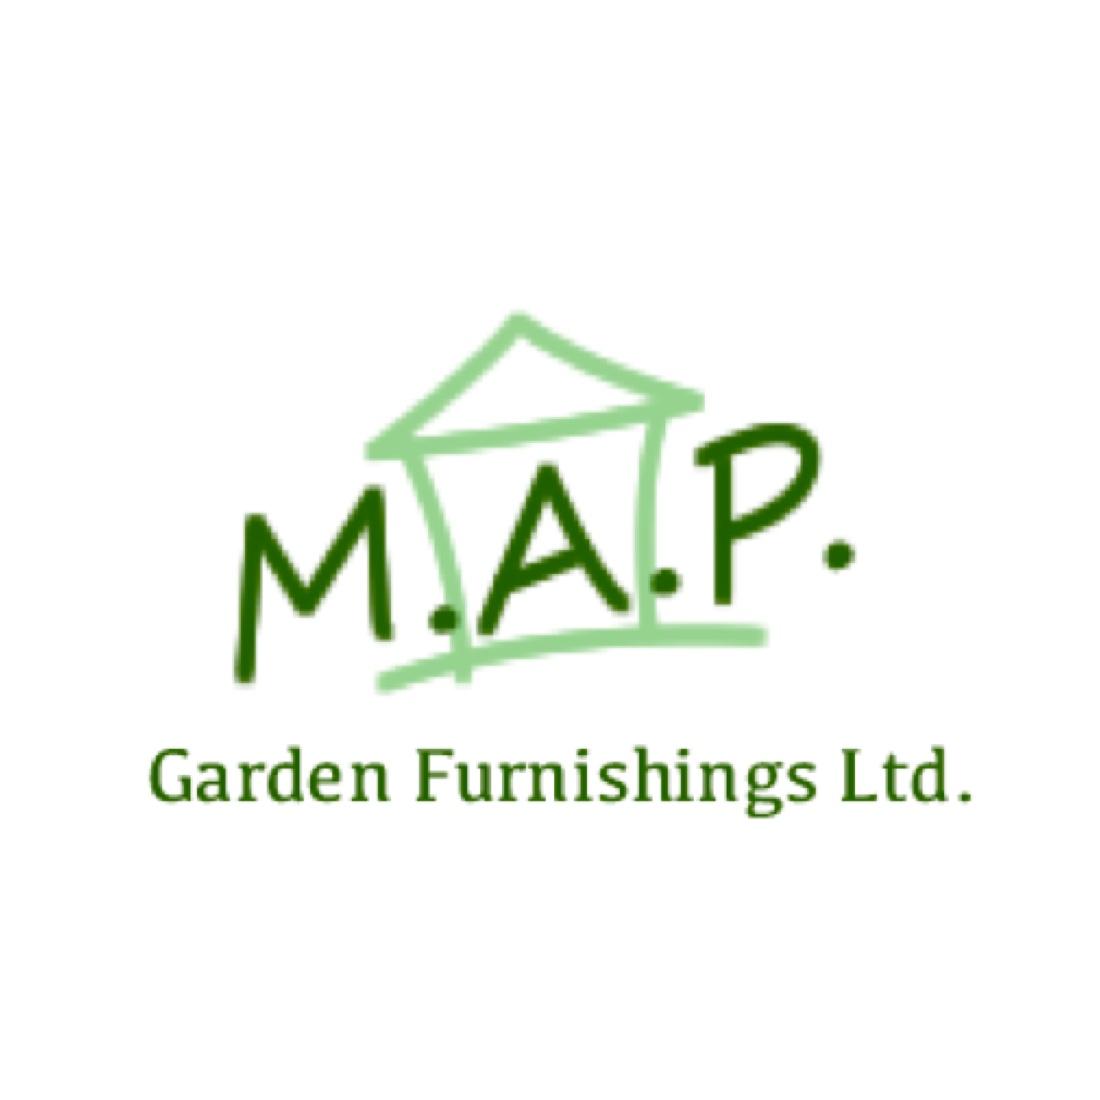 Protek Wood Stain & Protector - Beaumont Blue (5 litre)